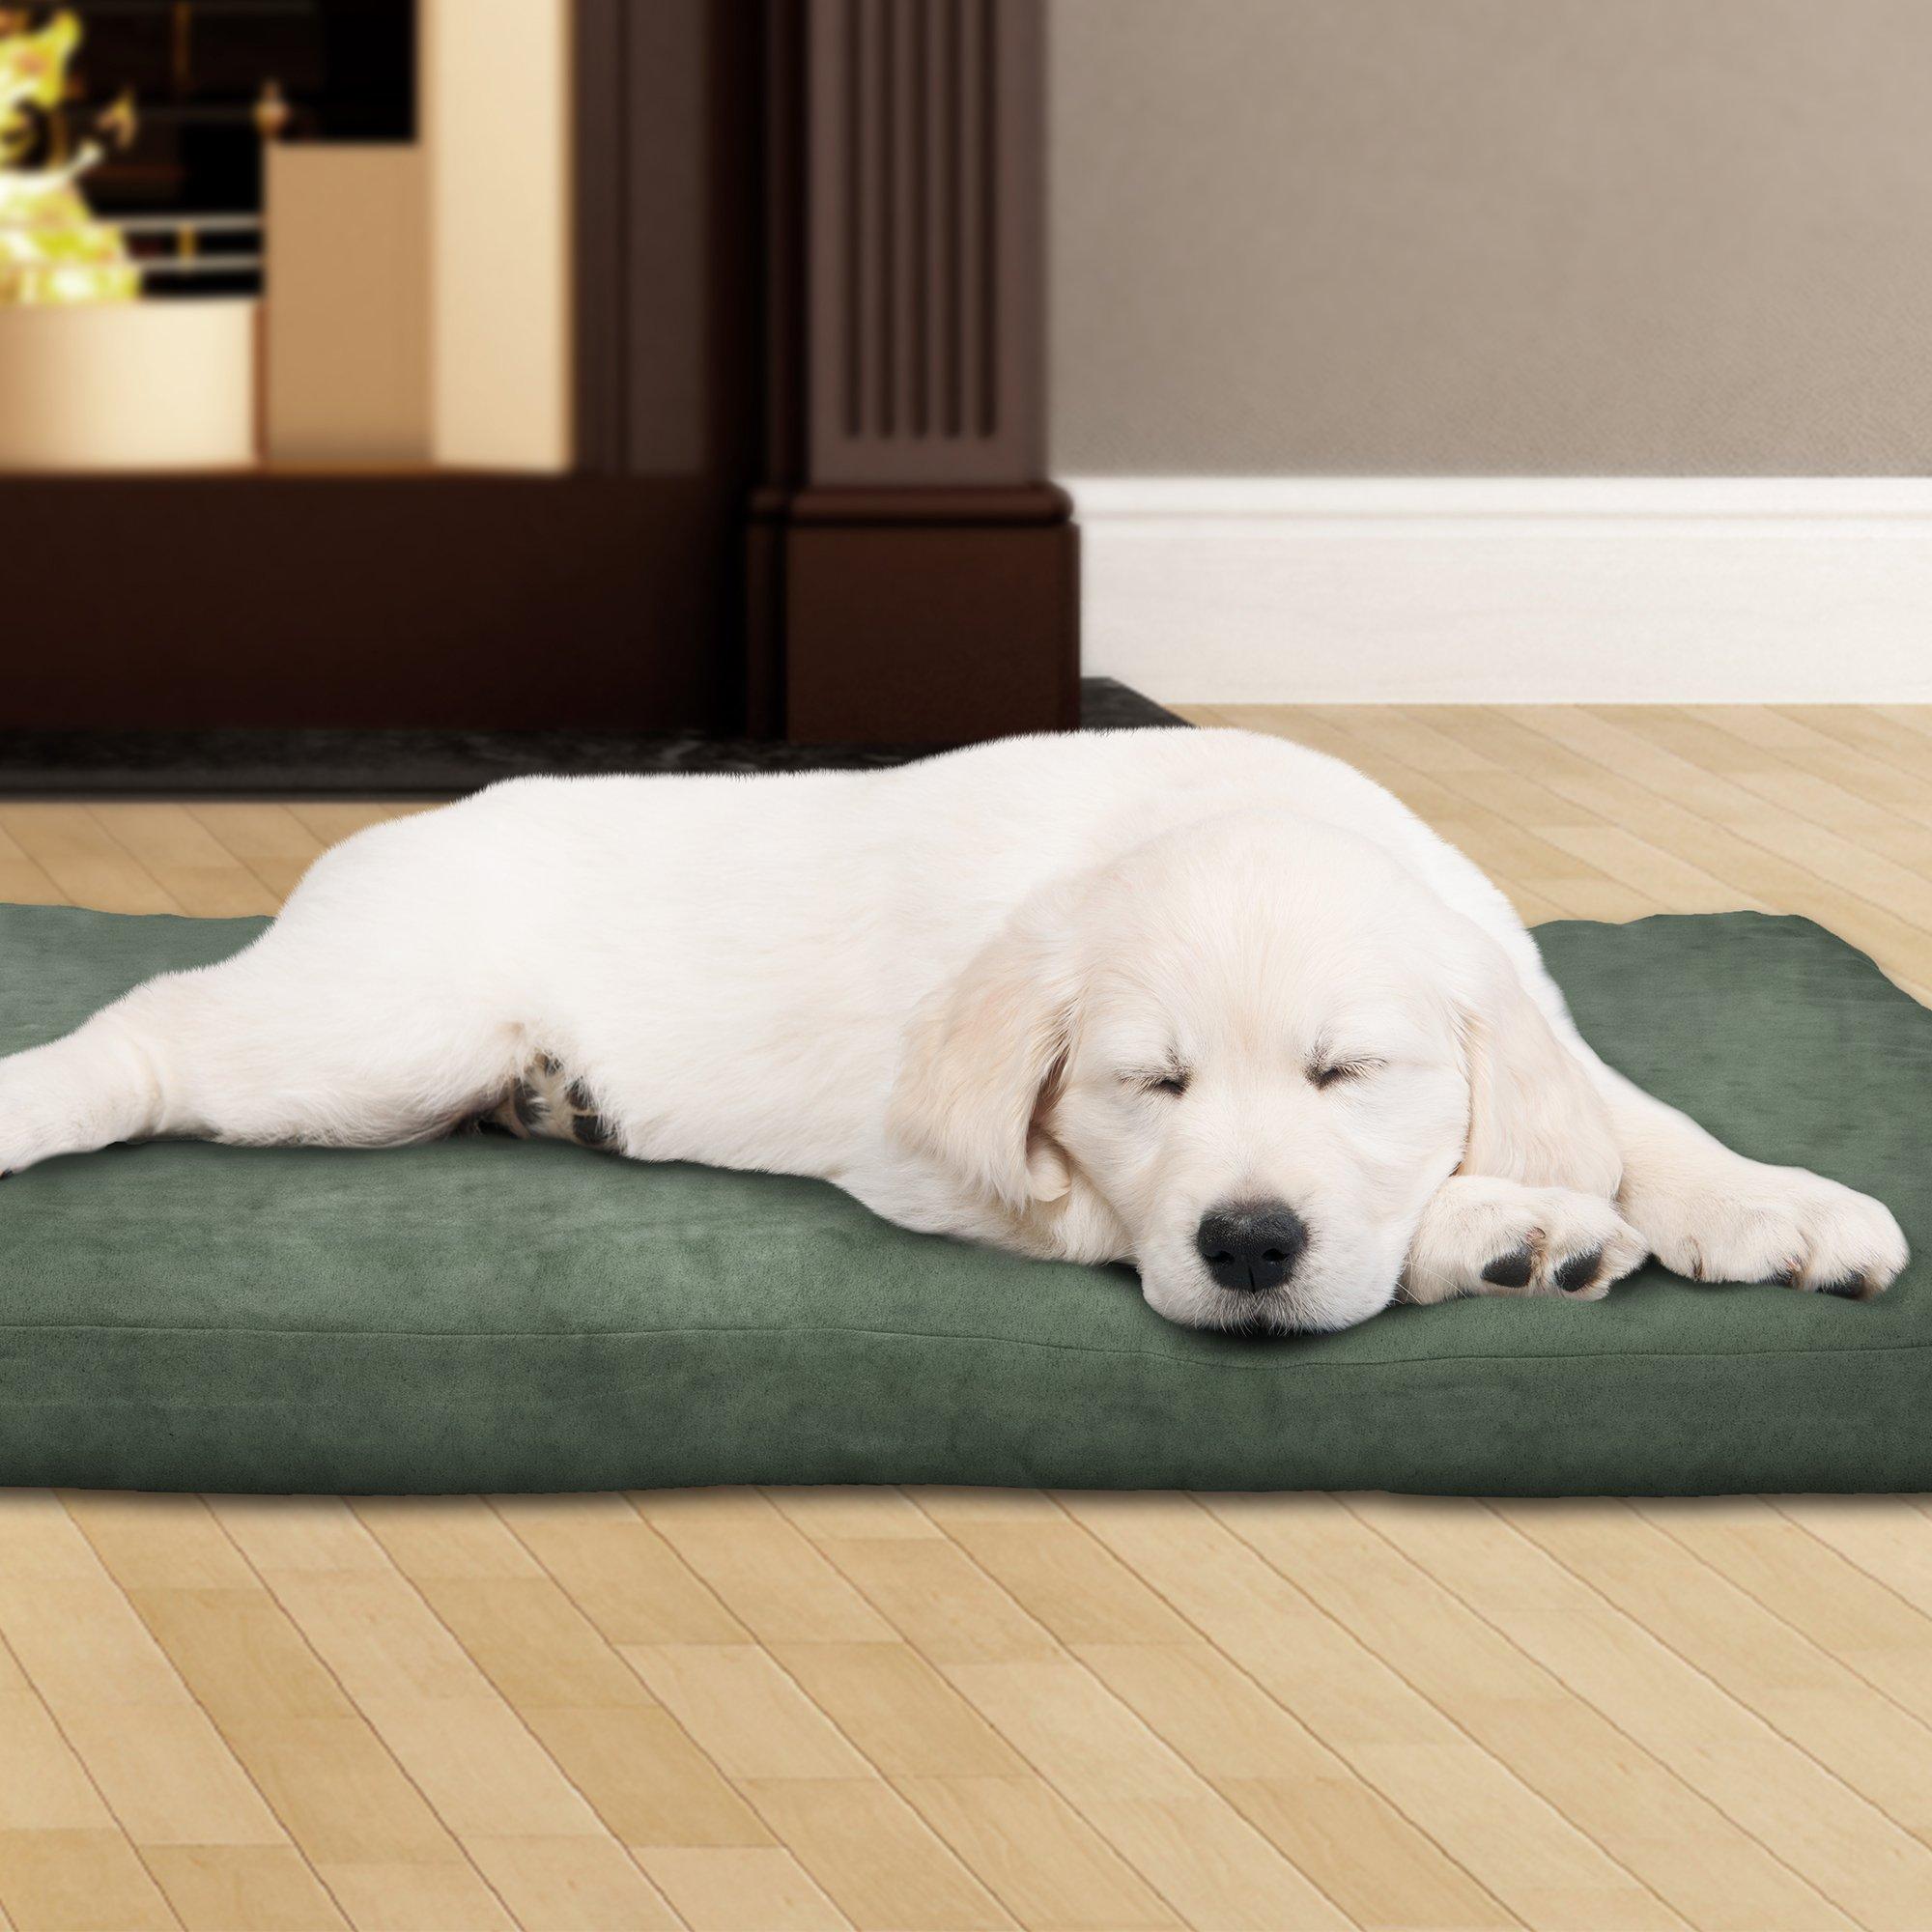 PETMAKER 80-PET4008 3'' Foam Pet Bed 35 x 44, Forest Tan